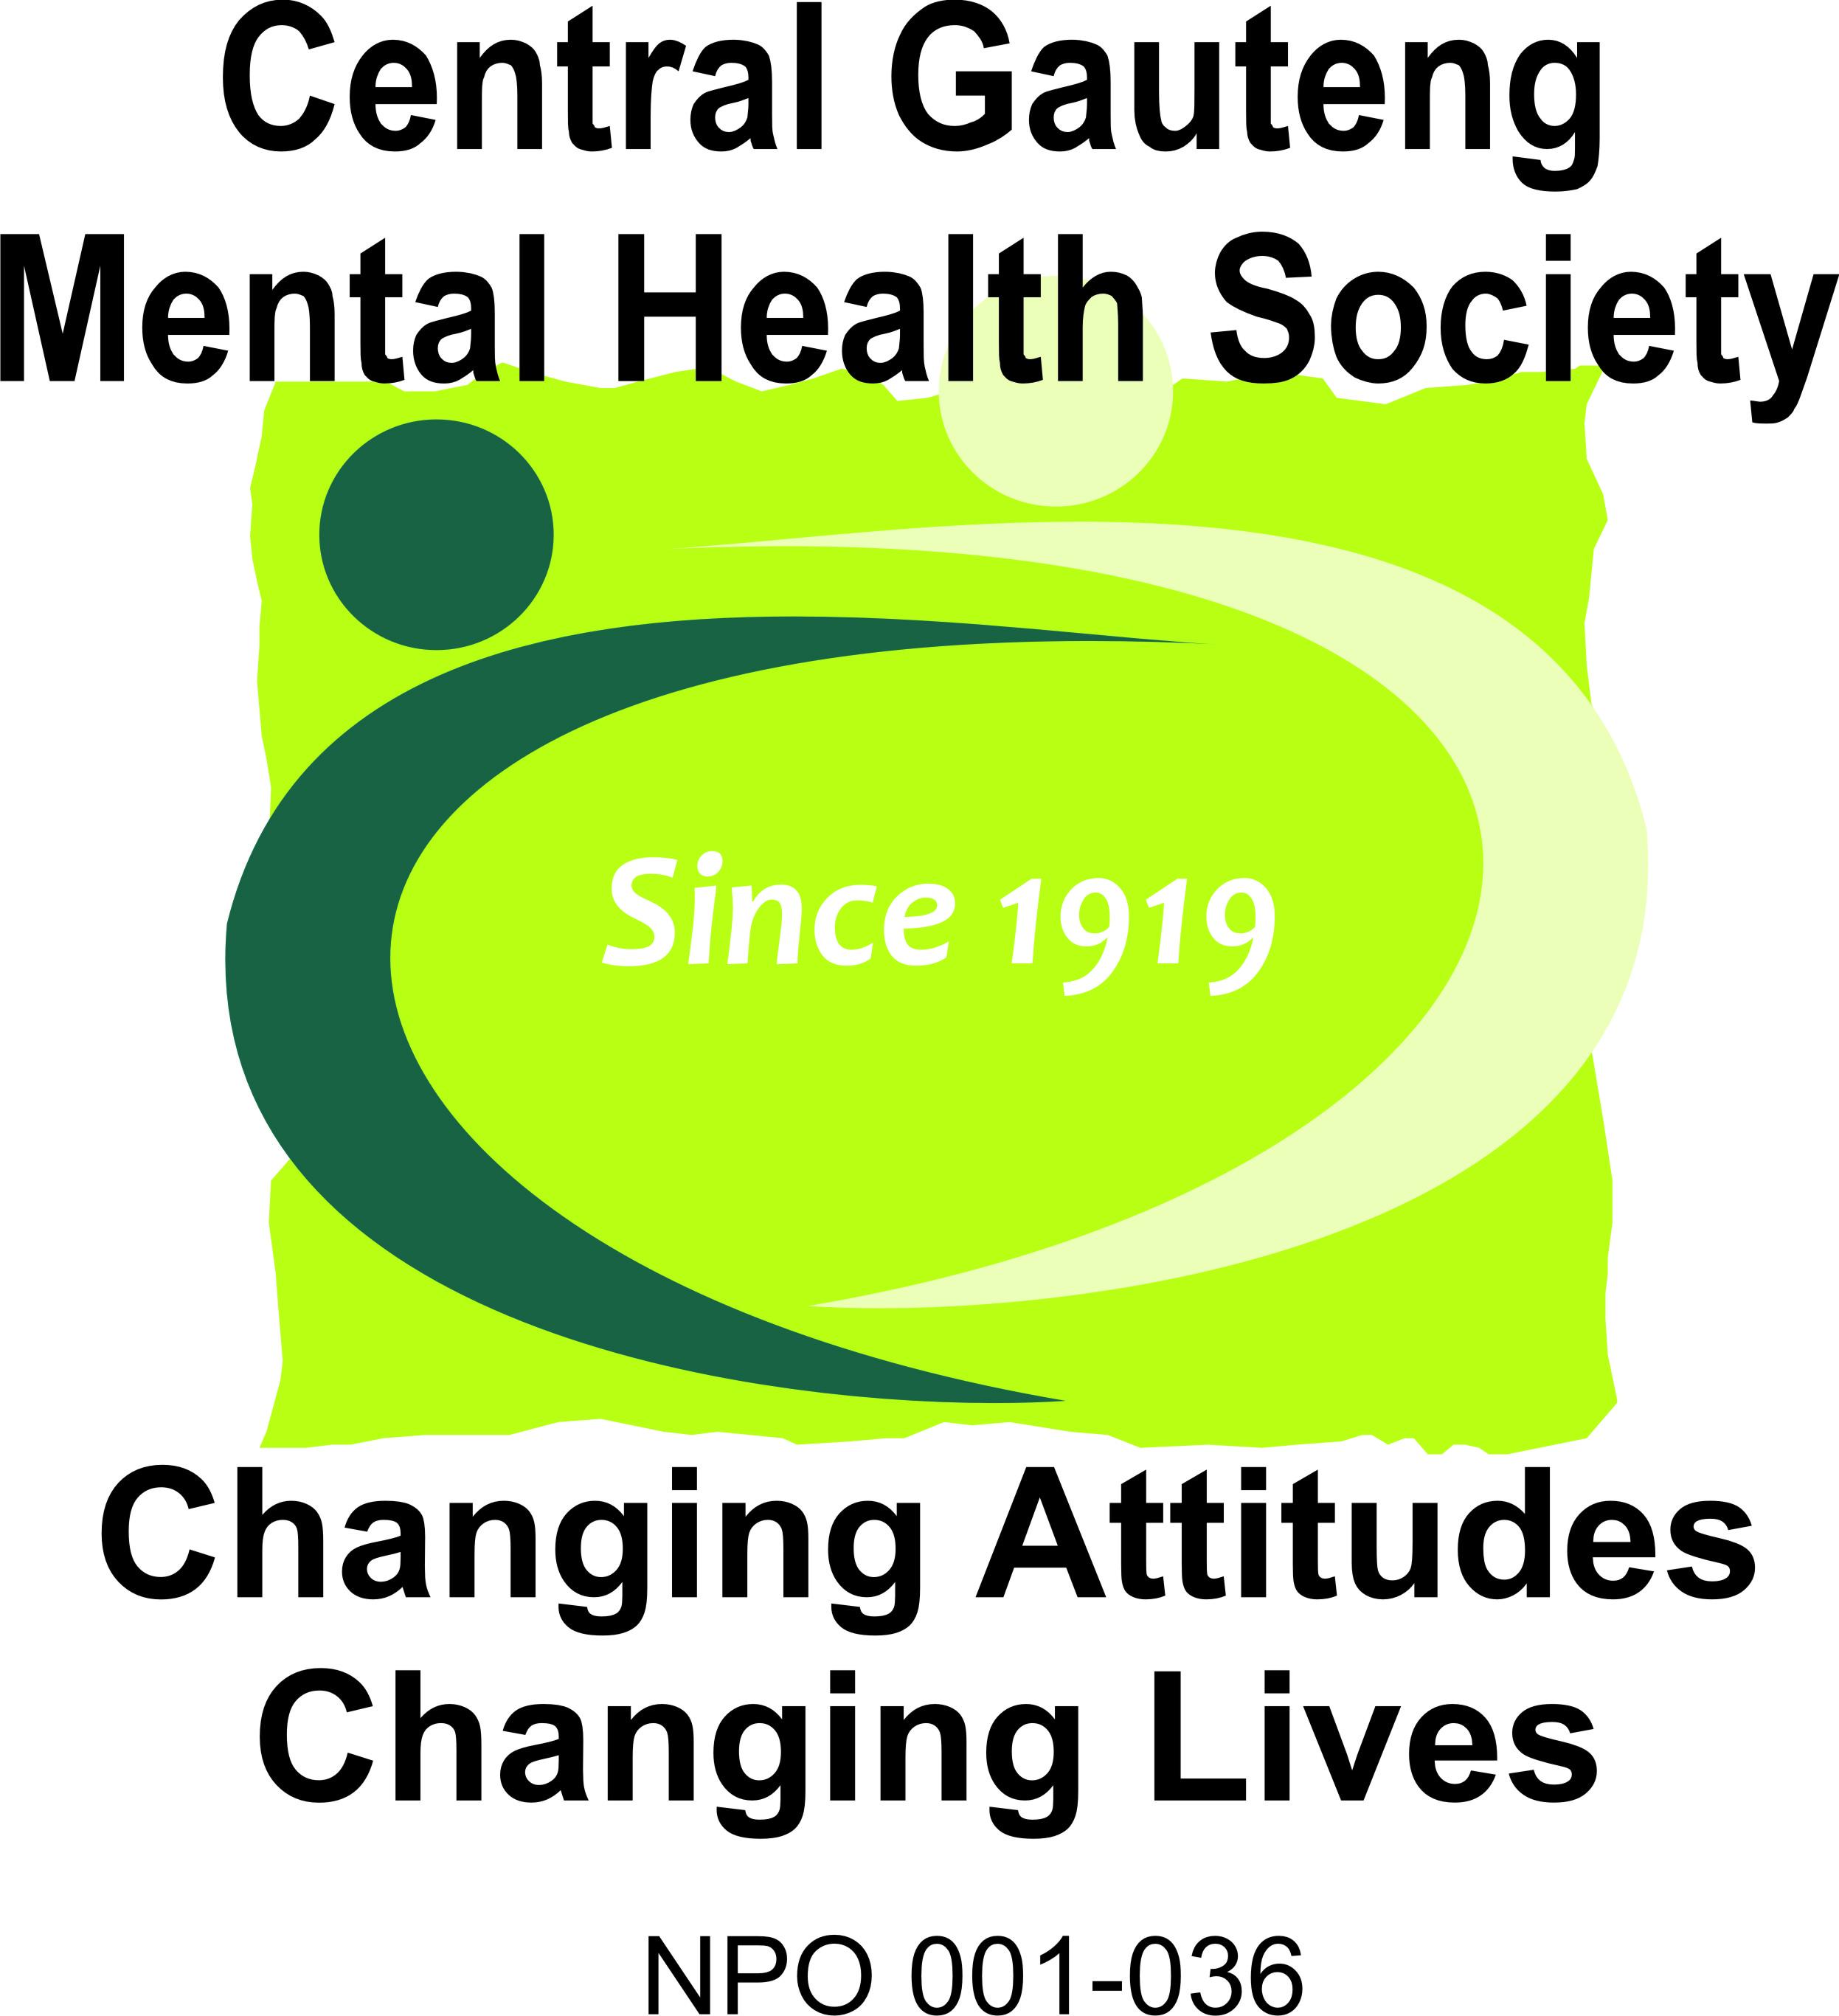 Central Gauteng Mental Health Society Mental Health